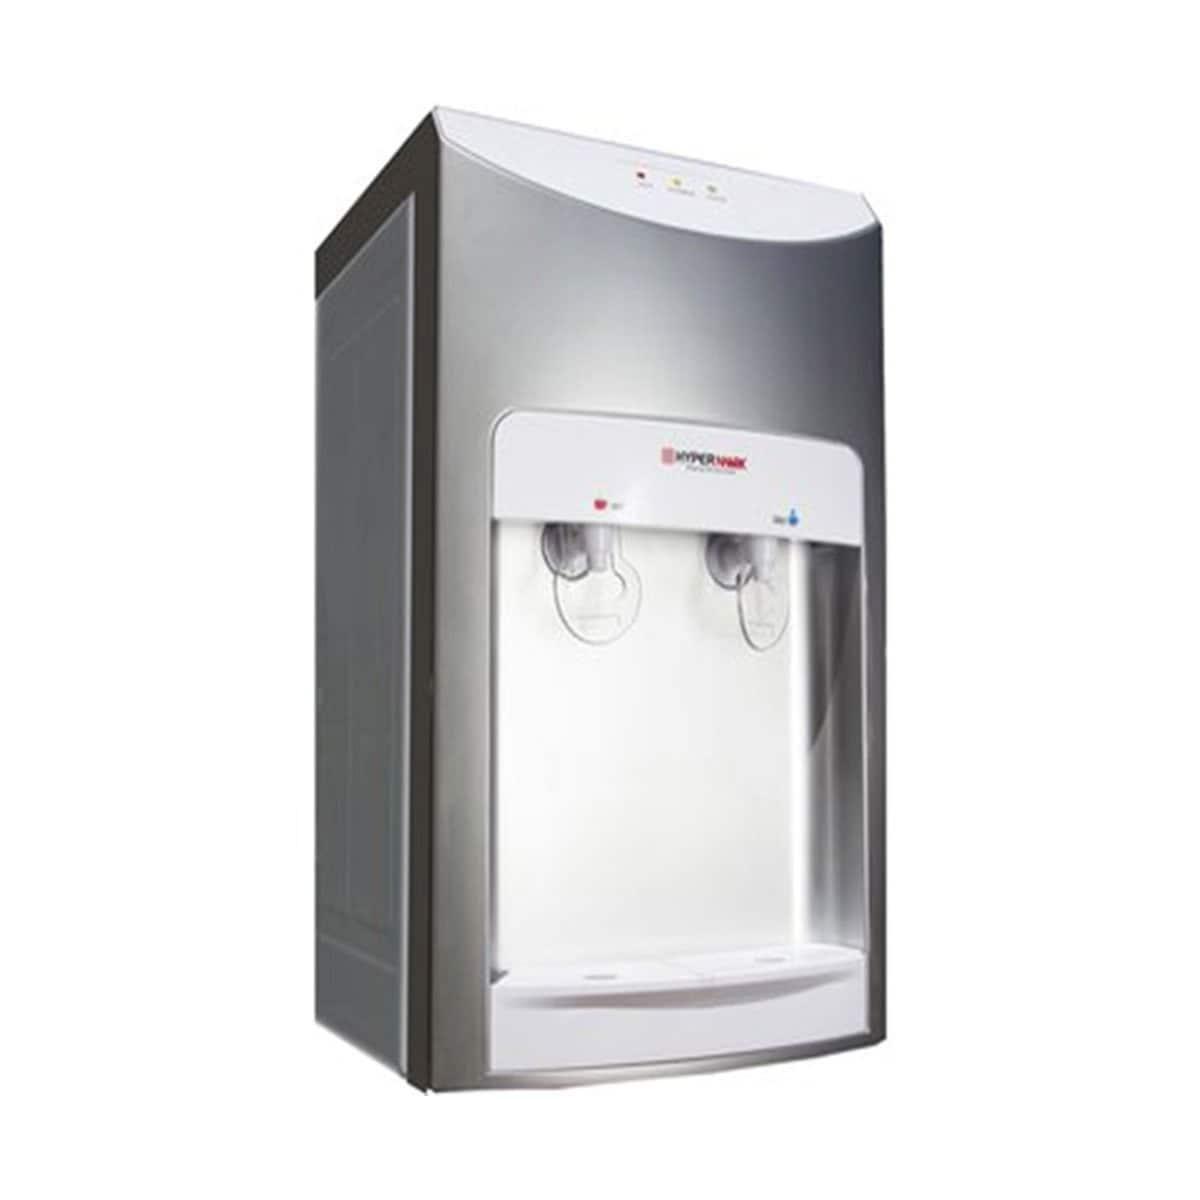 Dispensador de Agua Cleanwater Lite Hypermark